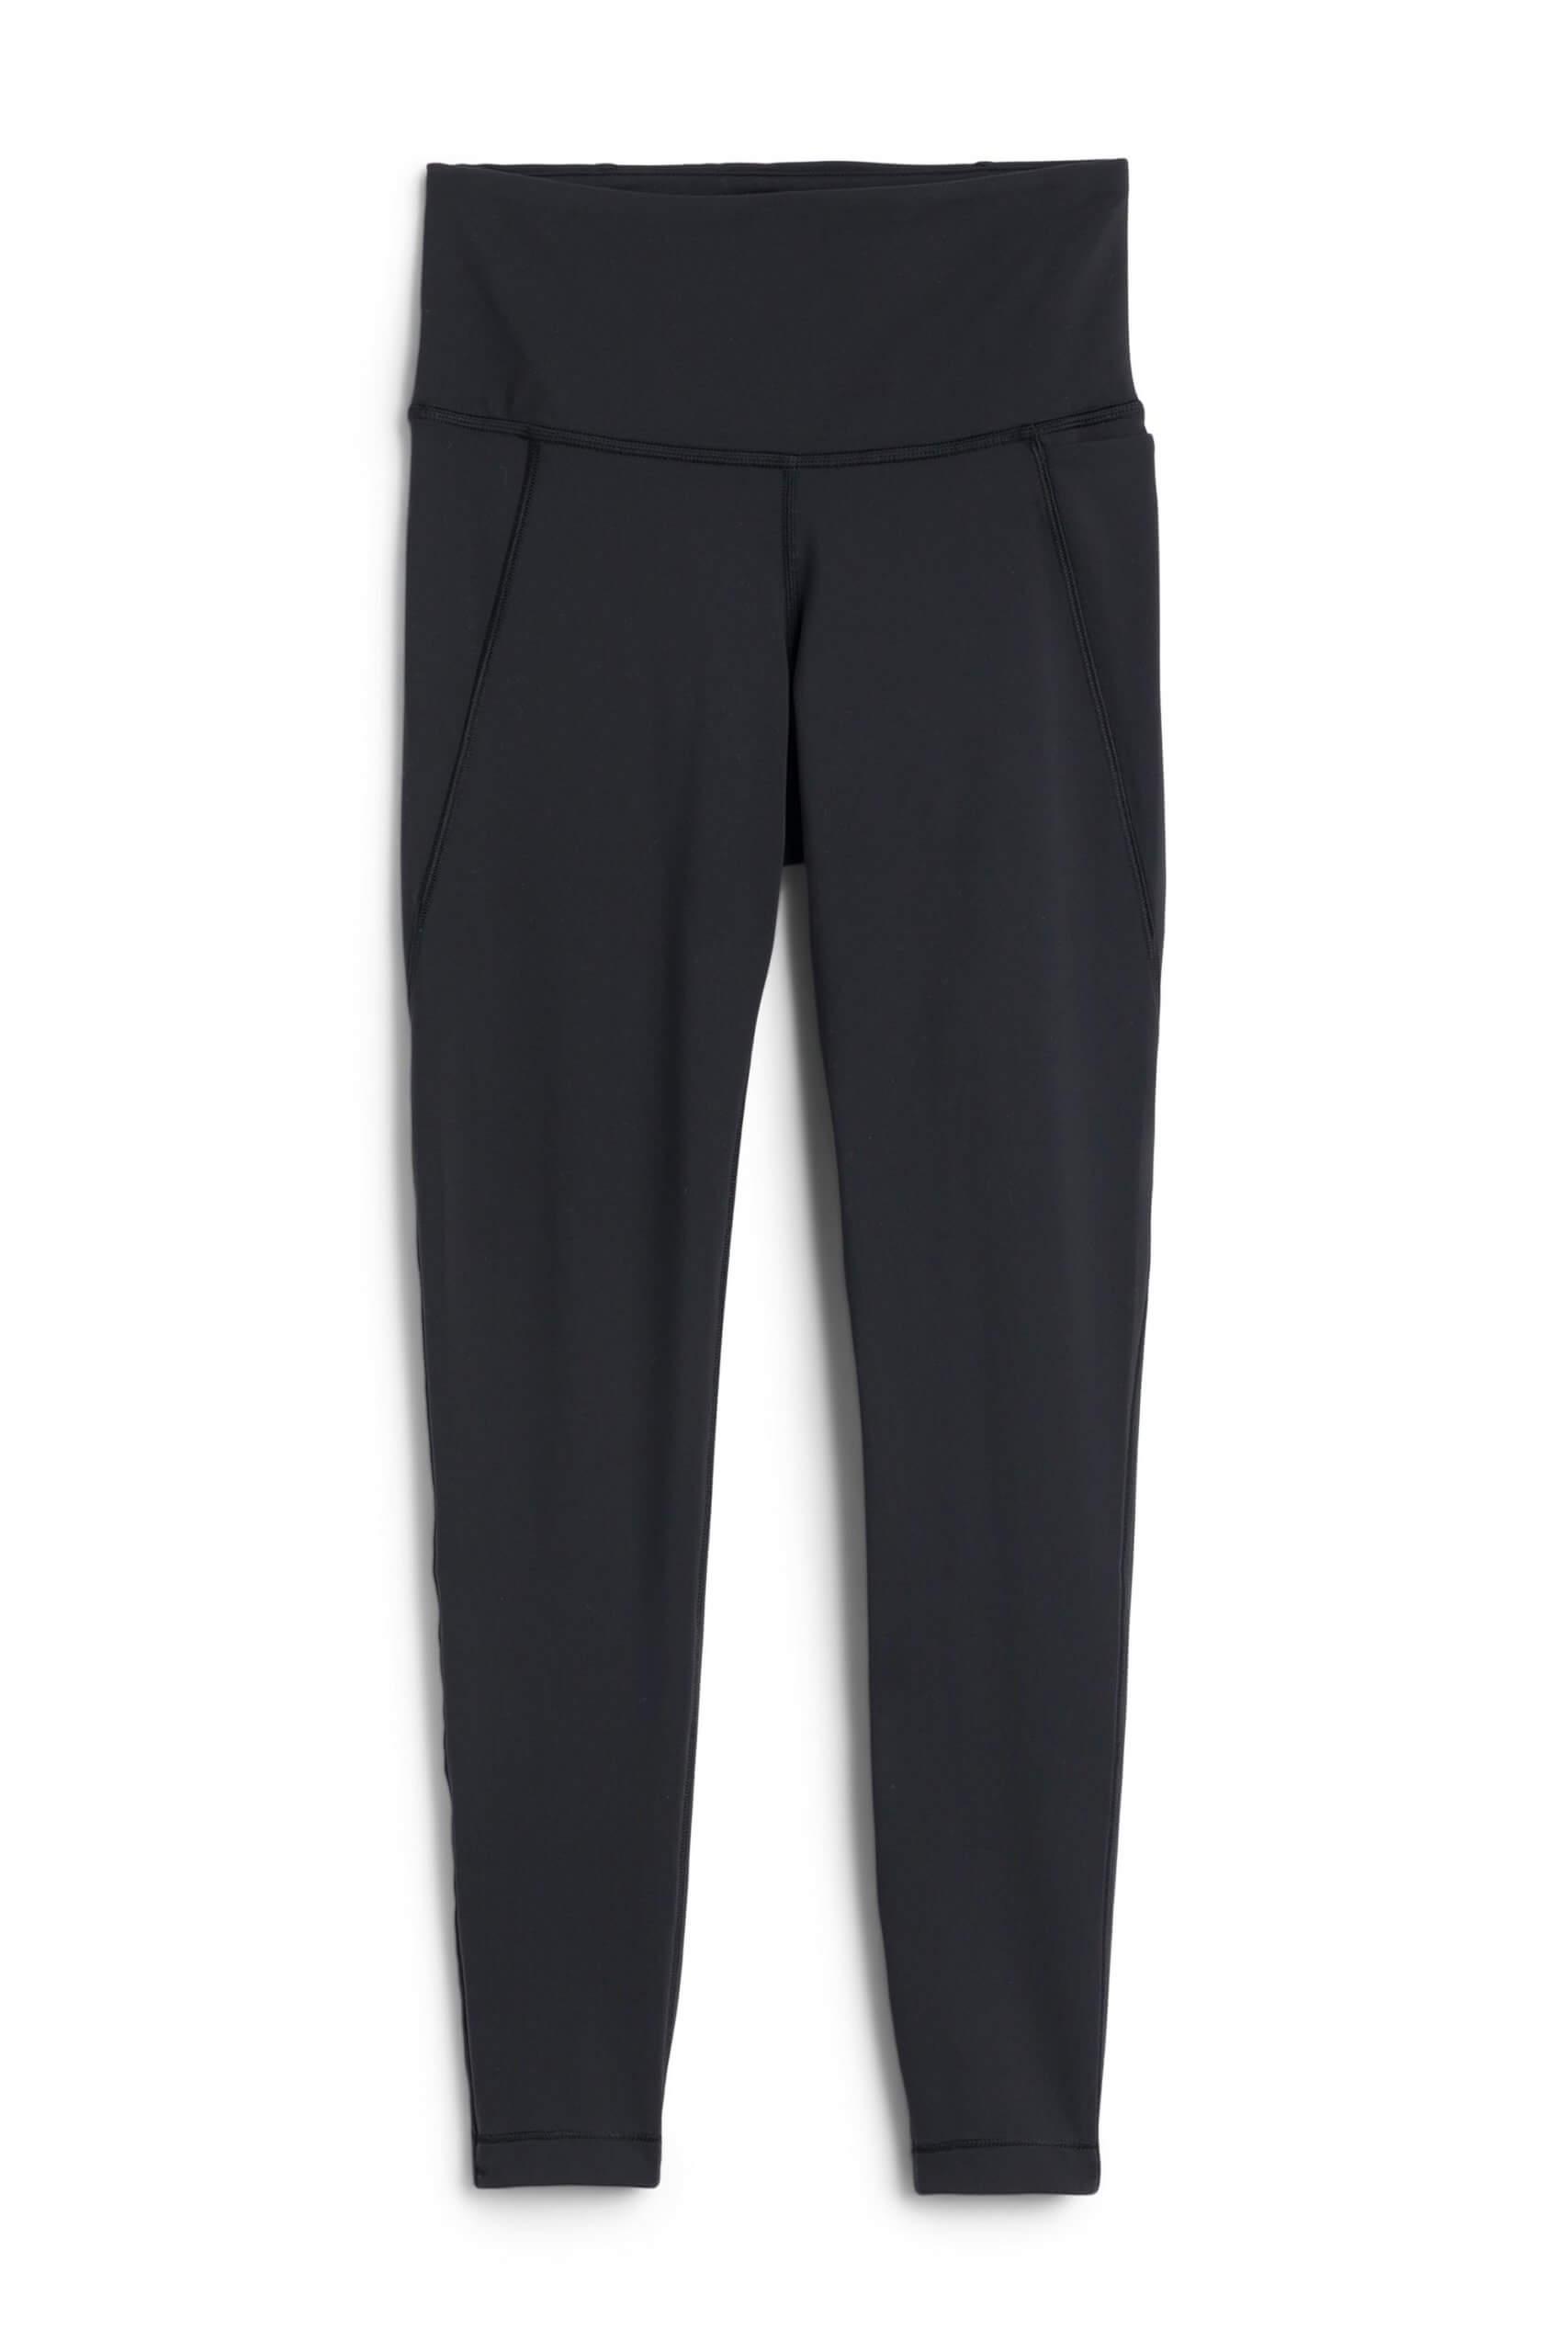 Stitch Fix Women's black leggings.